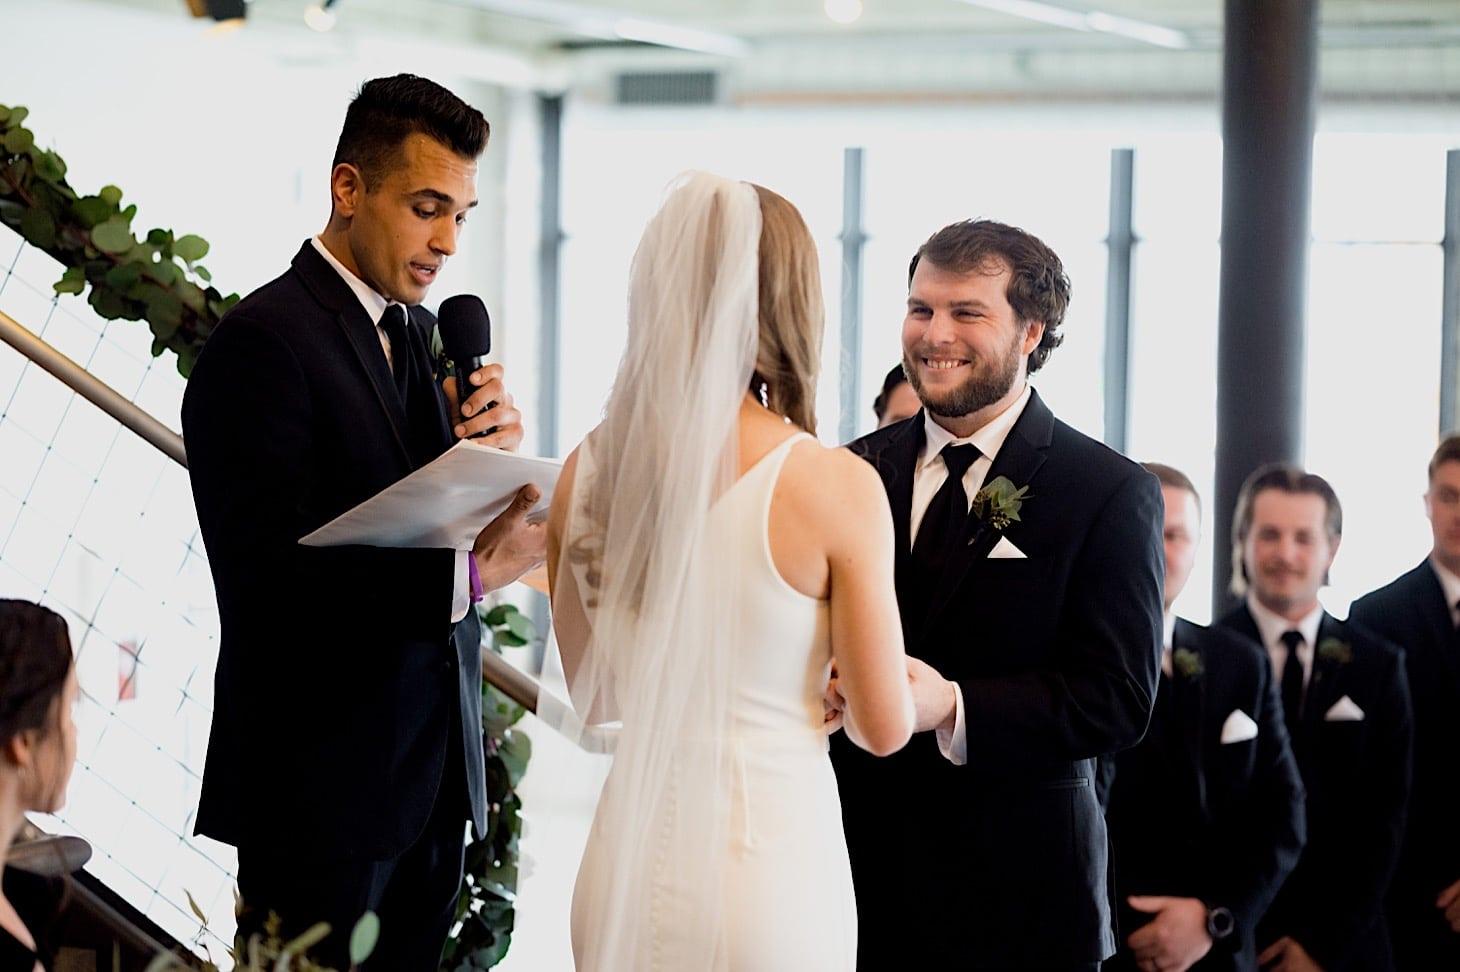 Des Moines River Center wedding ceremony